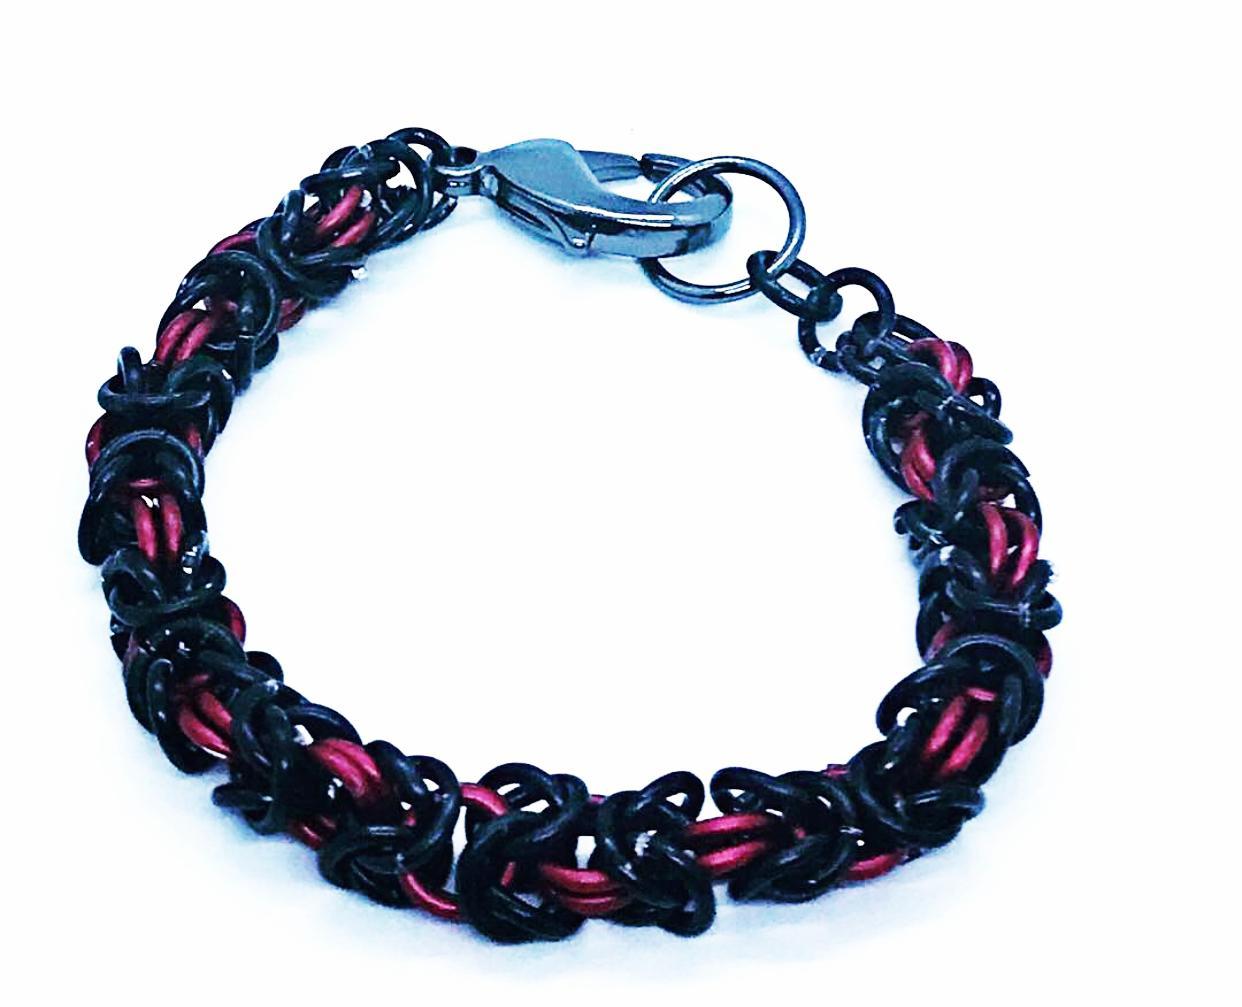 Image of Dark fire-Men's Box chain bracelet